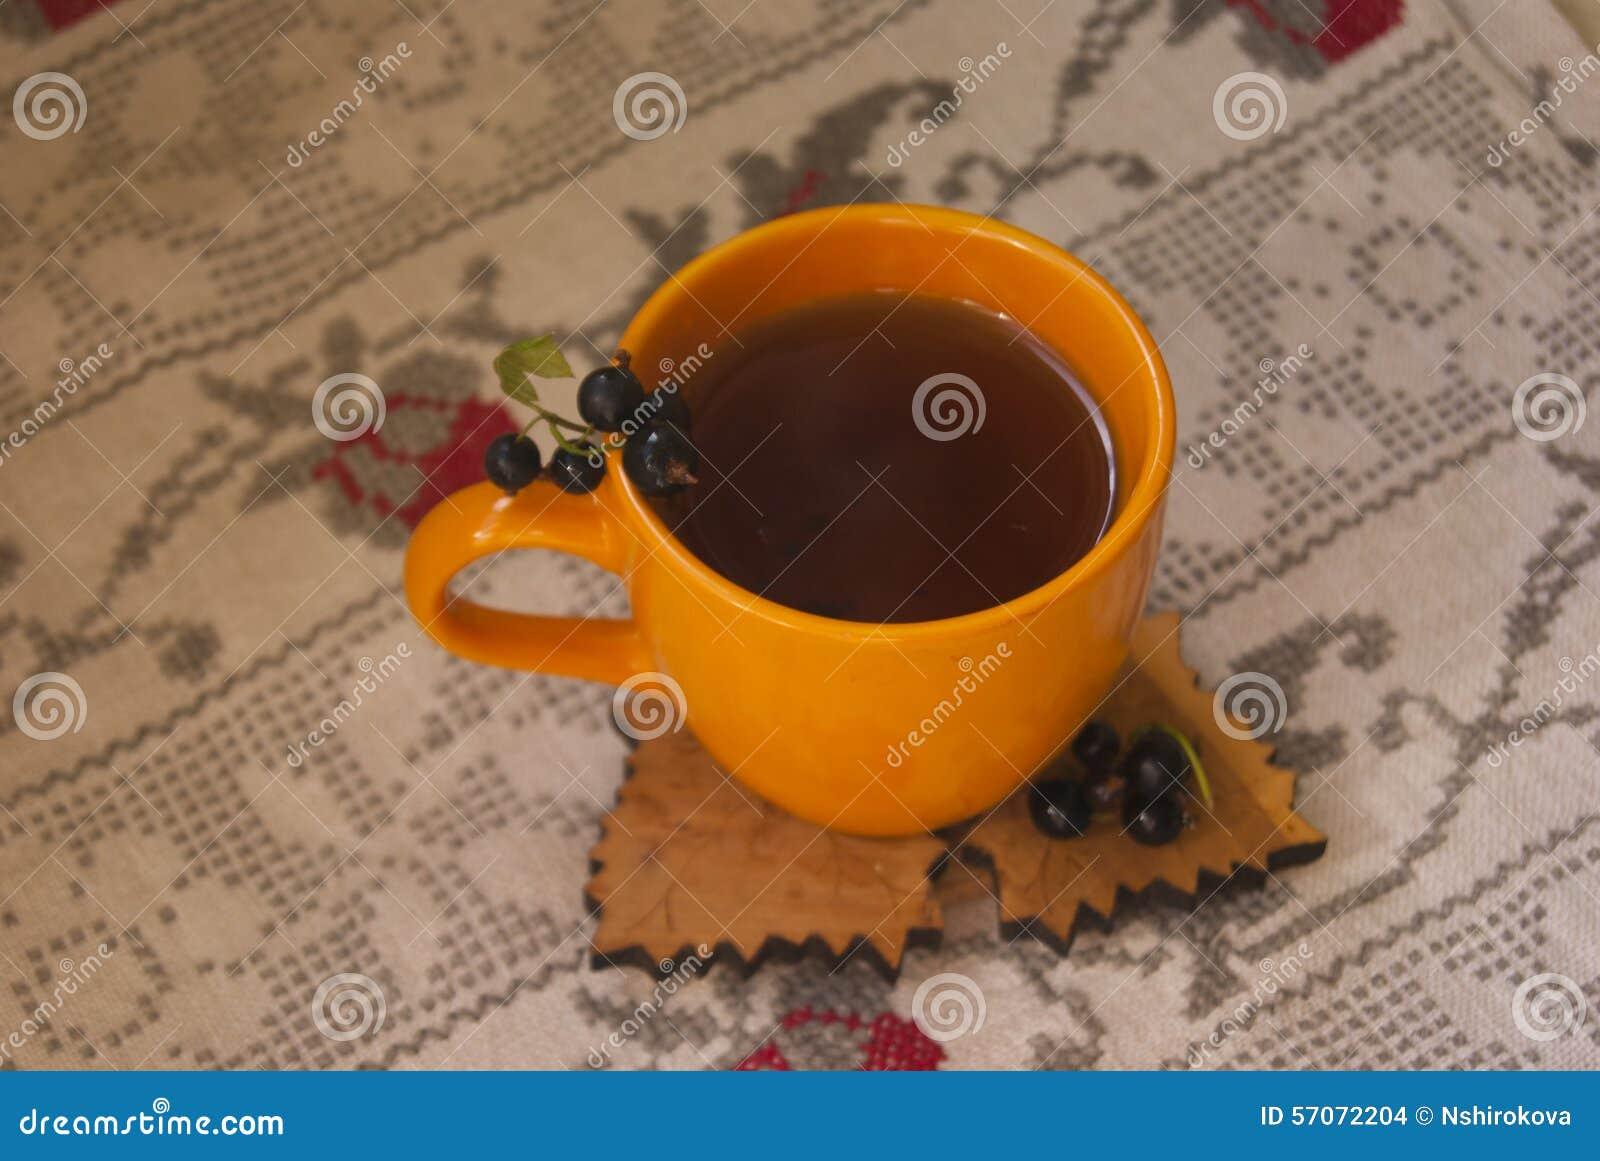 Kleikop thee